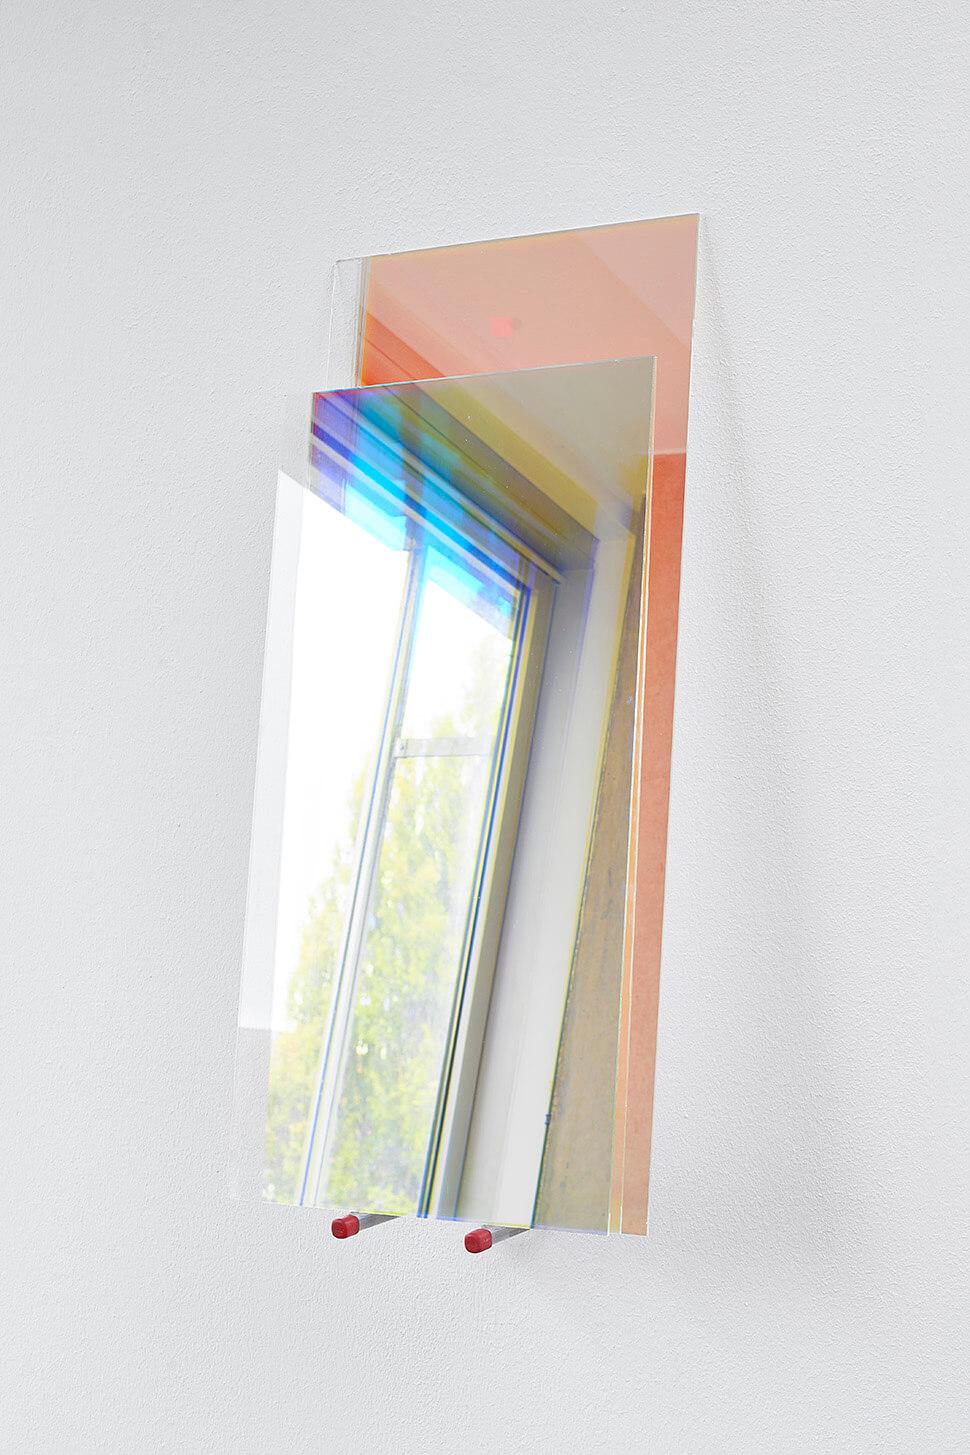 6D_NicolasWefers_ZGiR 23_Charlotte Mumm_Installation_ 5